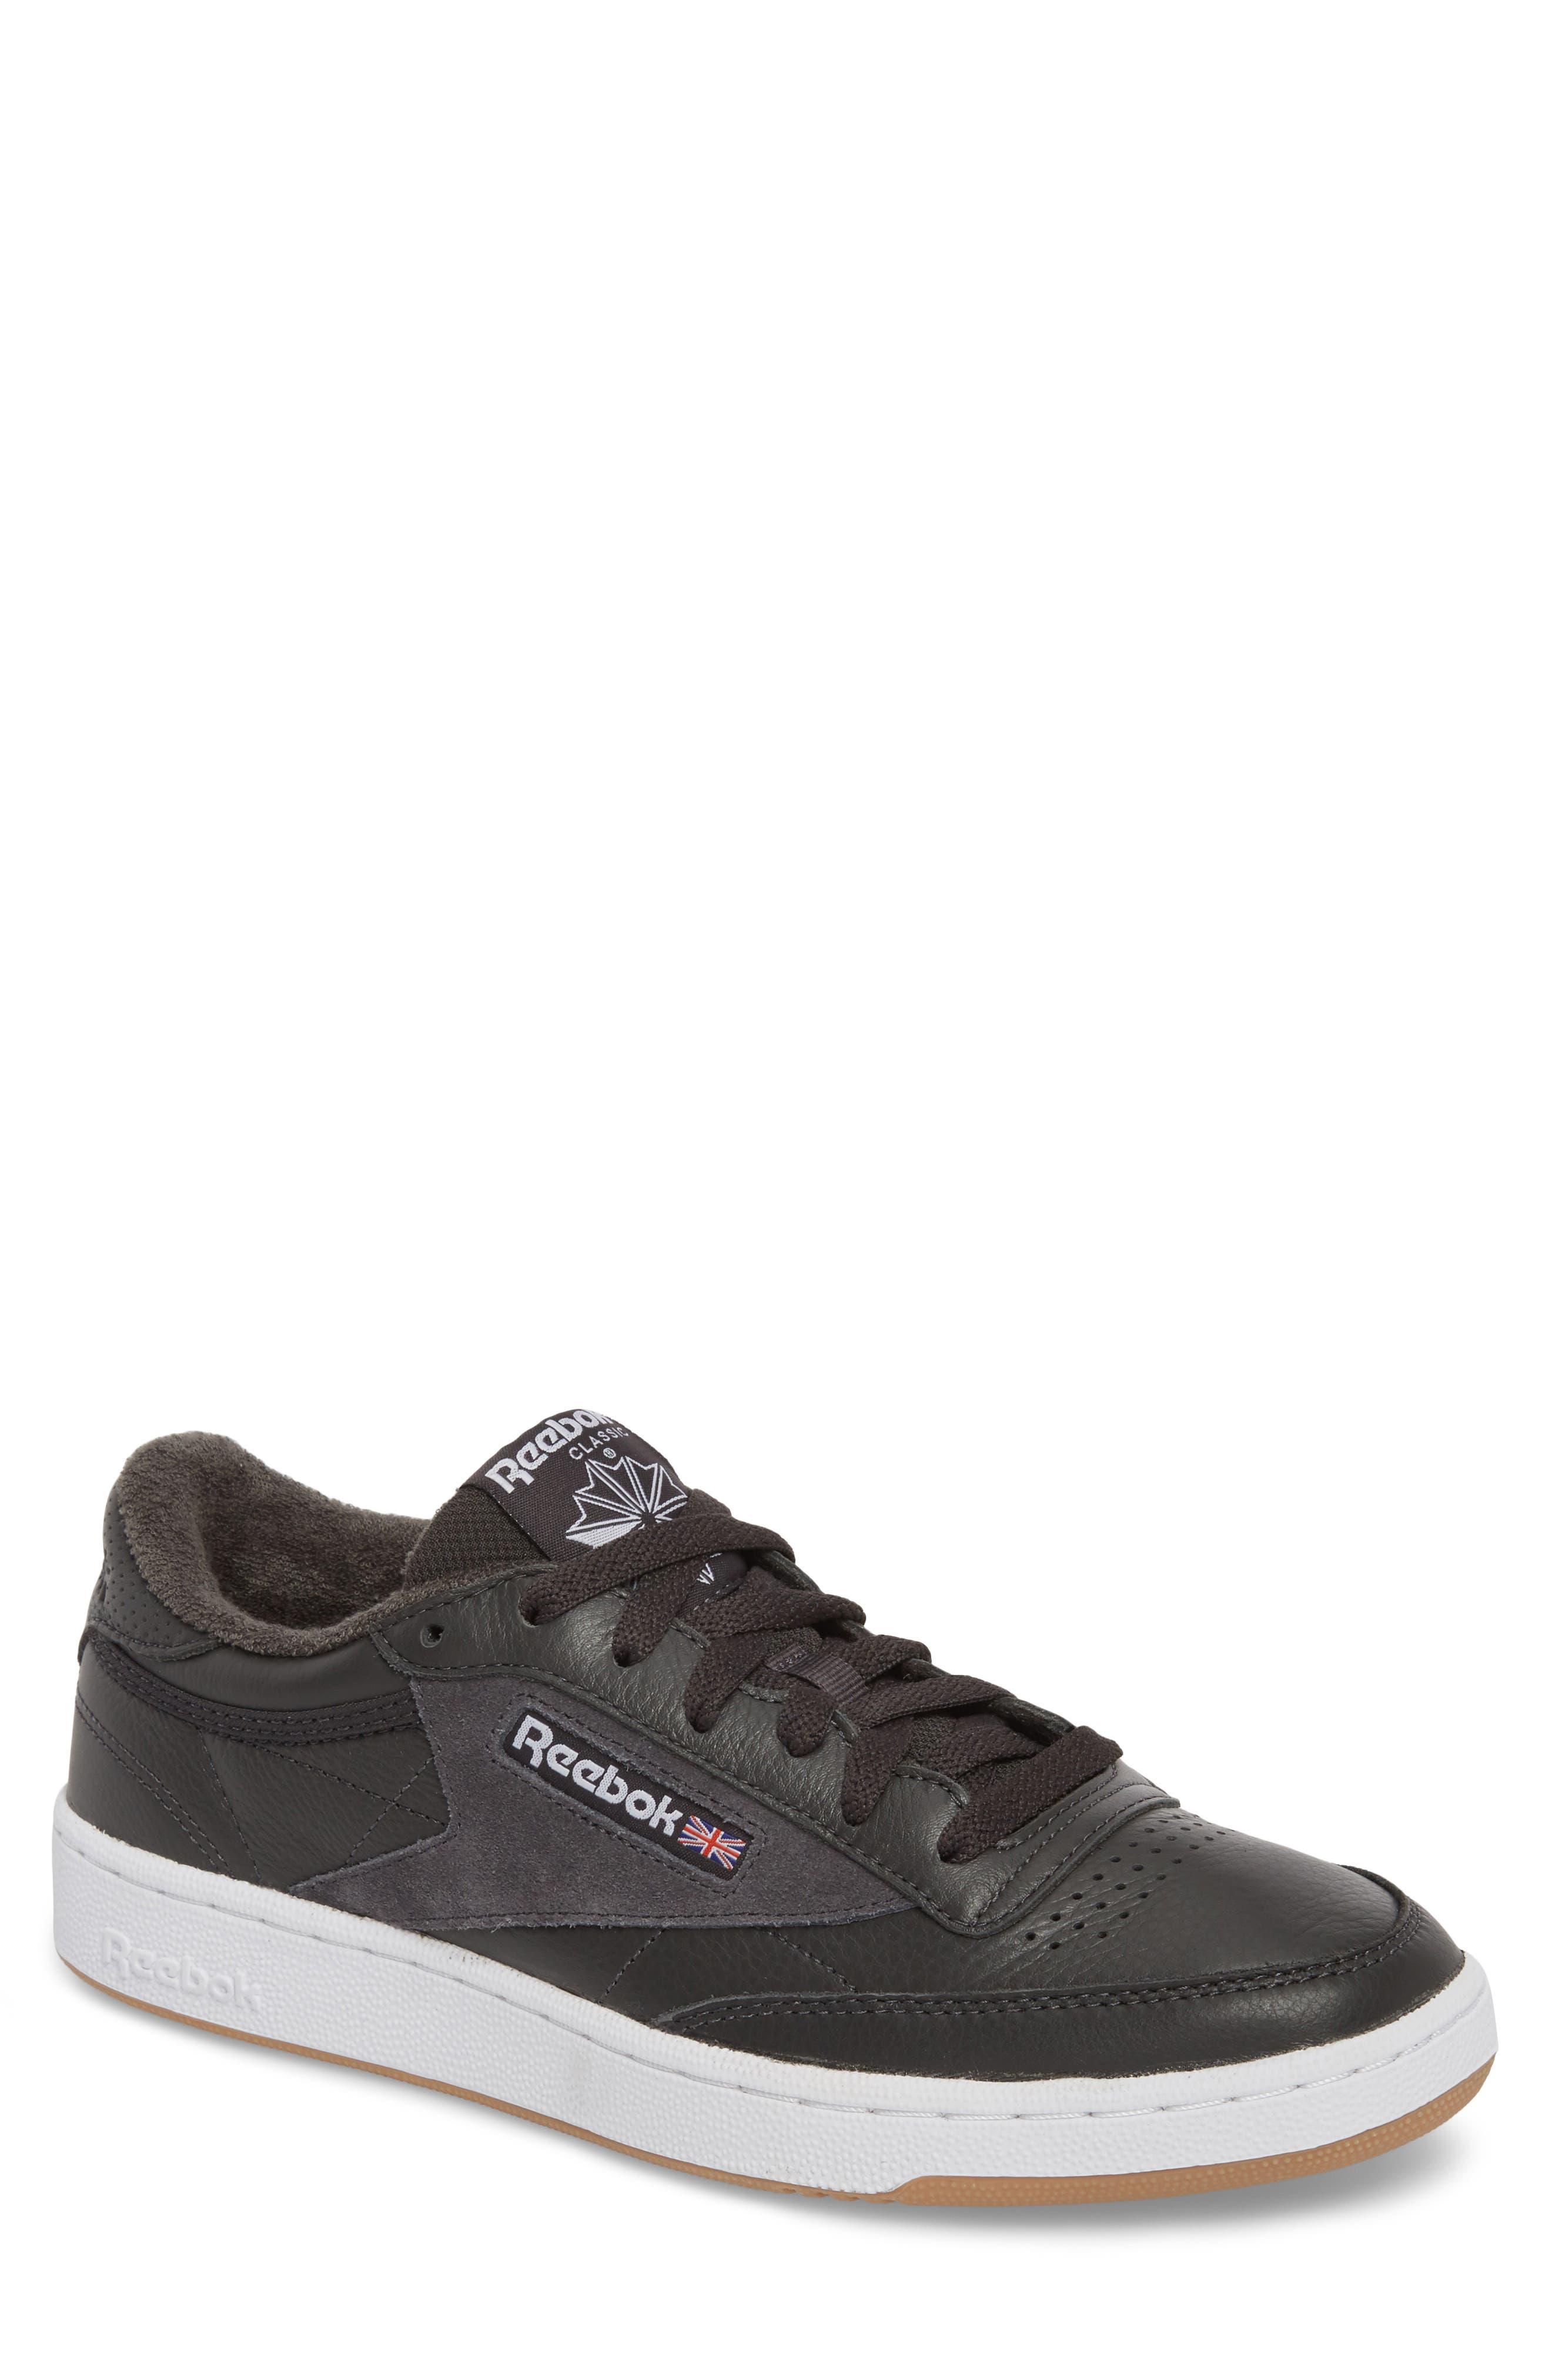 Club C 85 ESTL Sneaker,                         Main,                         color,